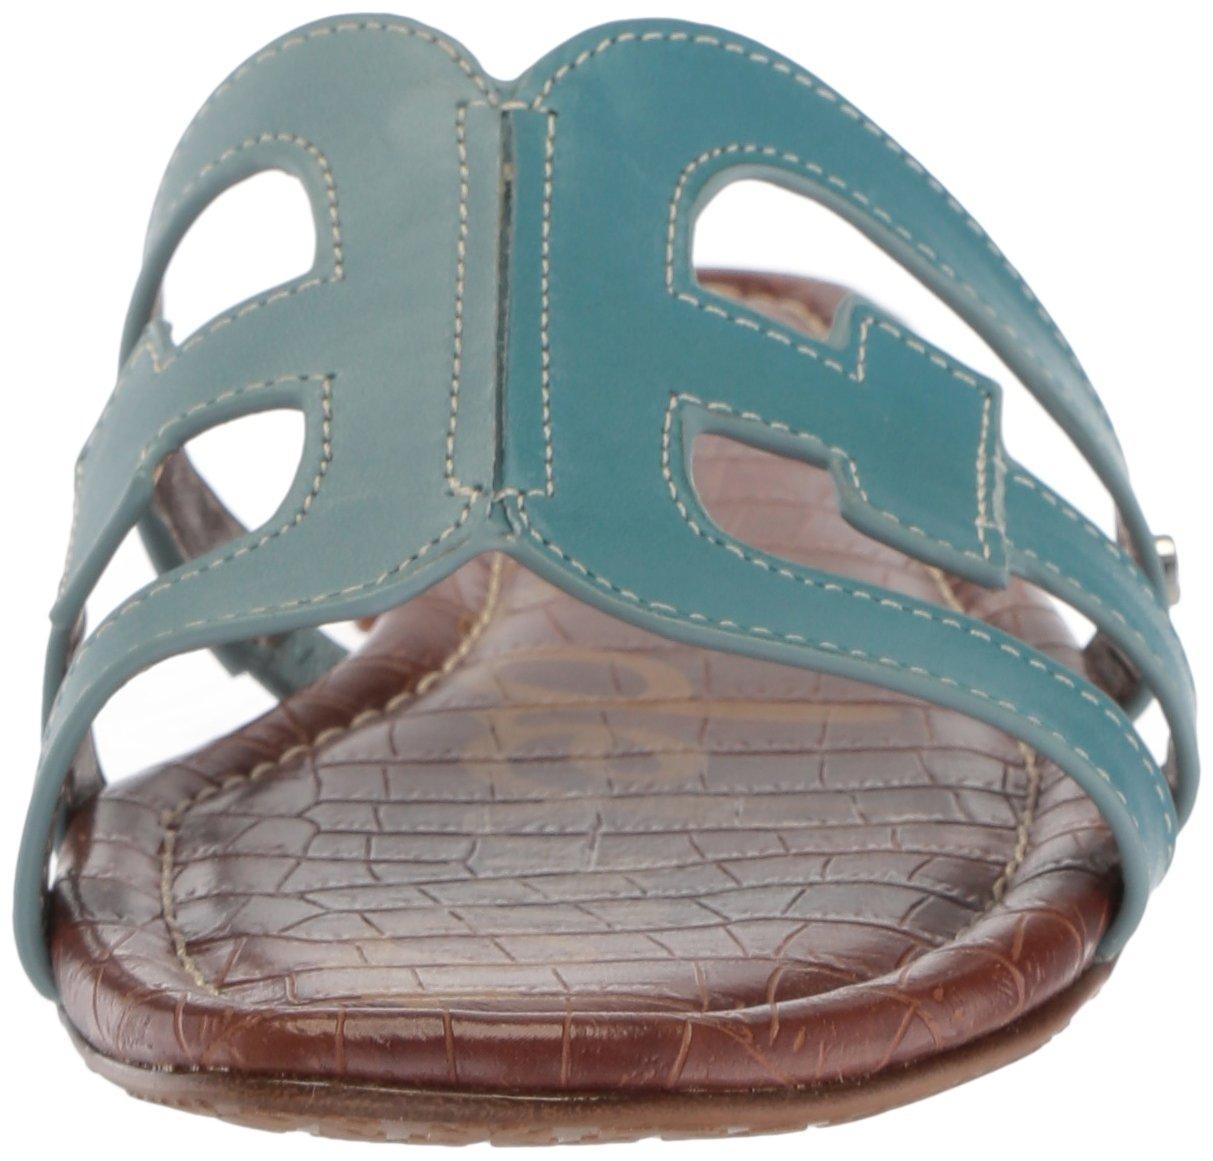 Sam edelman women 19234 s bay slide sandal b014ec9syi denim blue sam edelman women 19234 s bay slide sandal b014ec9syi denim blue blue new blue 6866a9a zarkoniaine spiritdancerdesigns Image collections